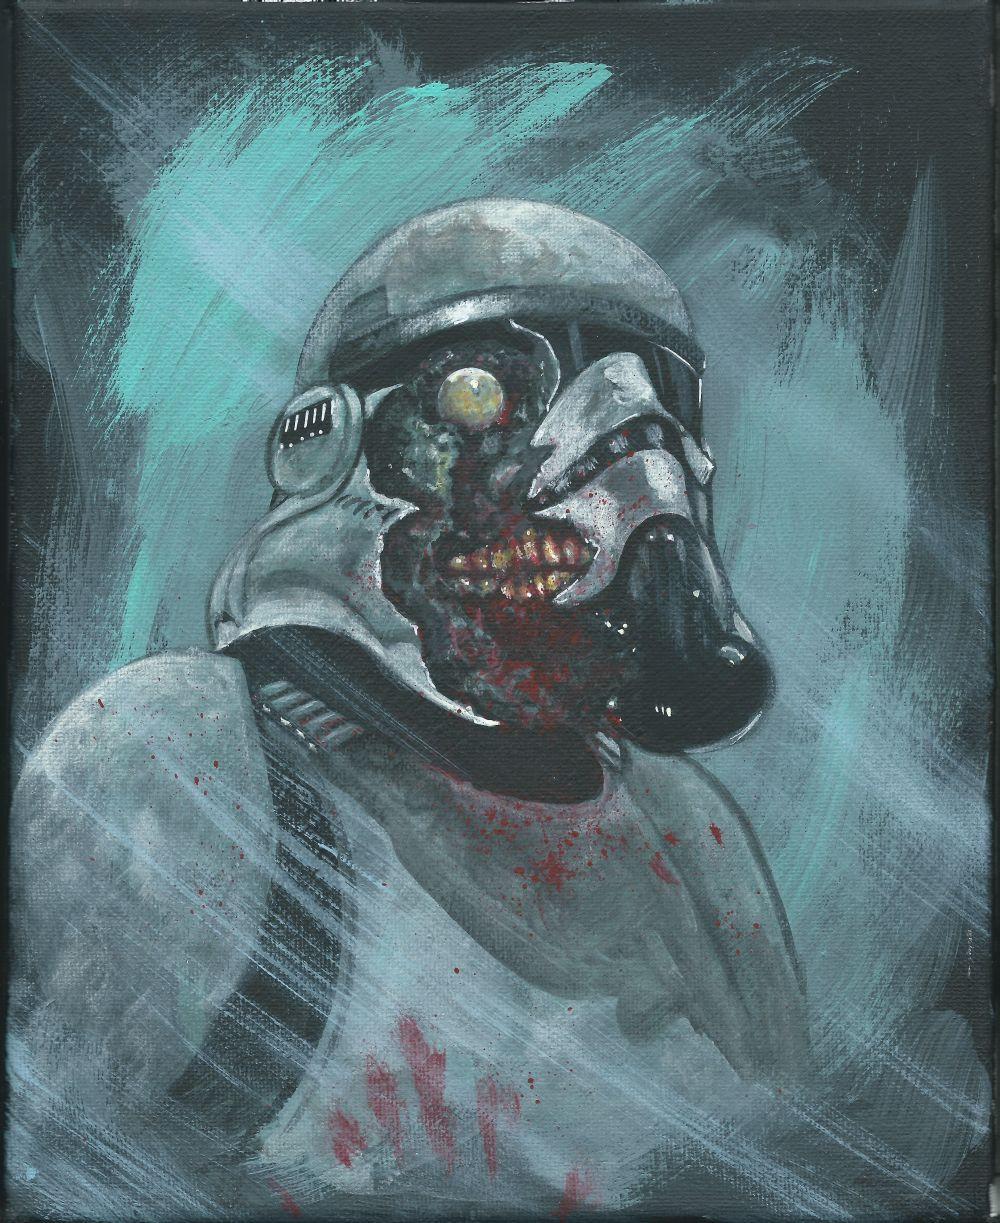 8x10 stormtrooper zombie.jpg